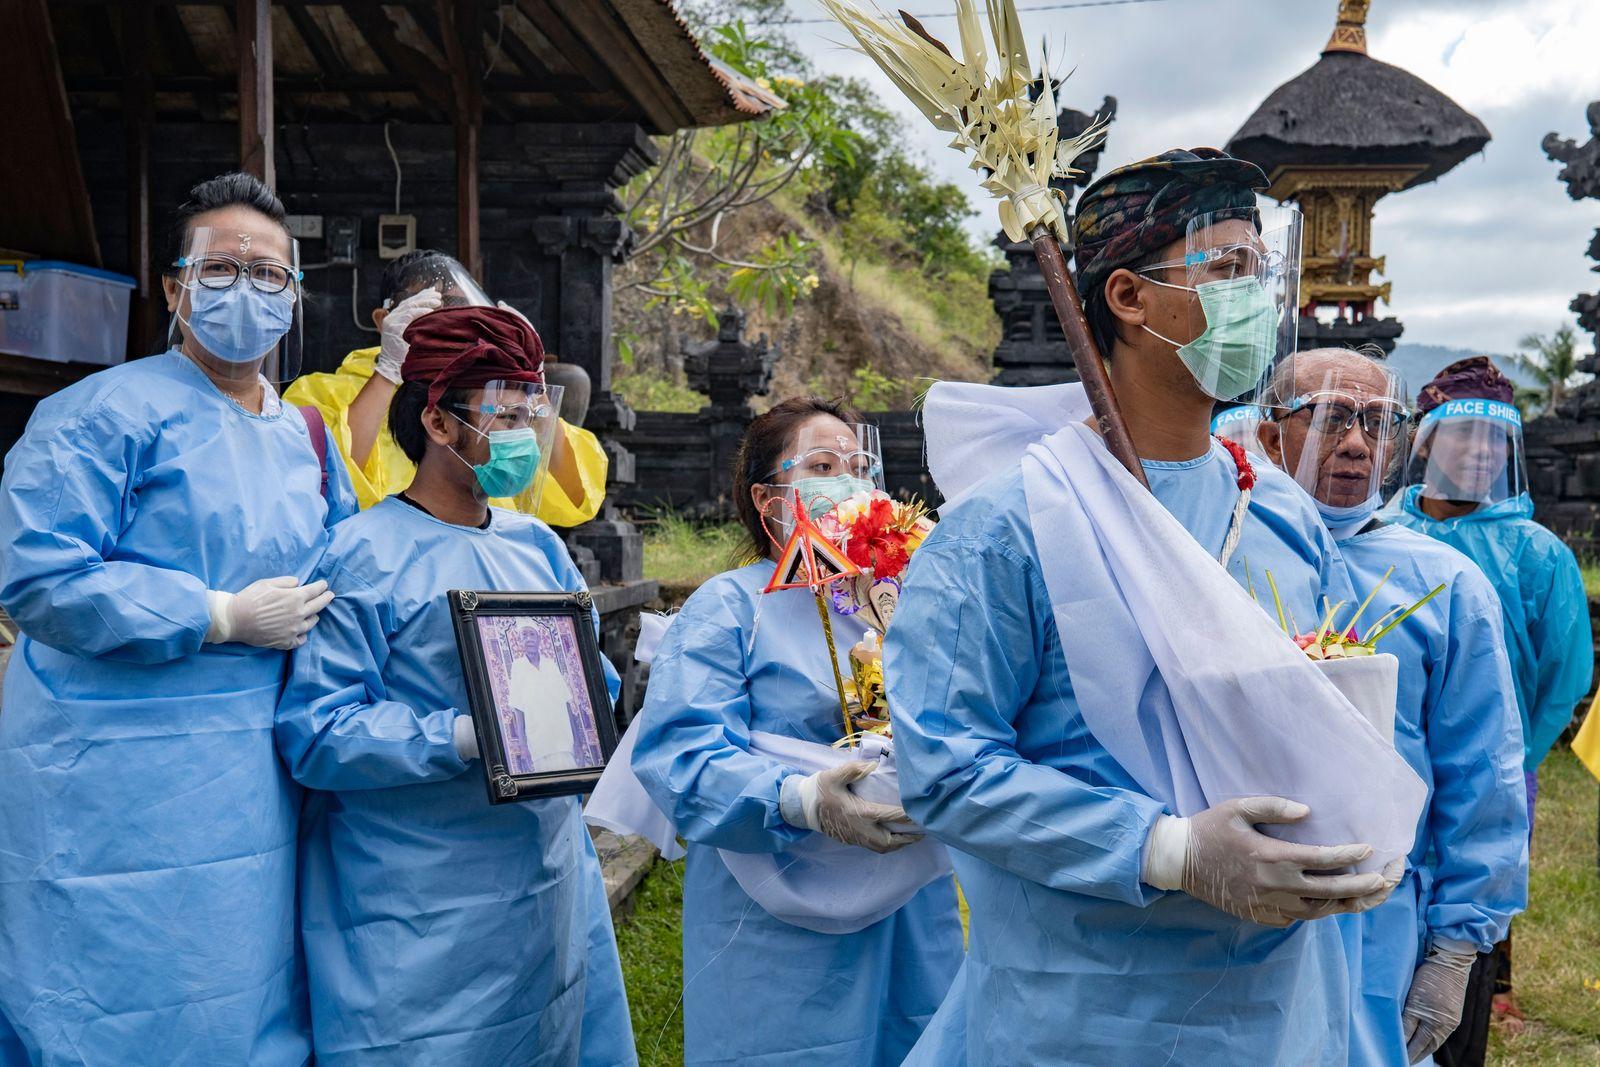 Hindu cremation ceremony amid coronavirus pandemic in Bali, Klungkung, Indonesia - 21 Aug 2020